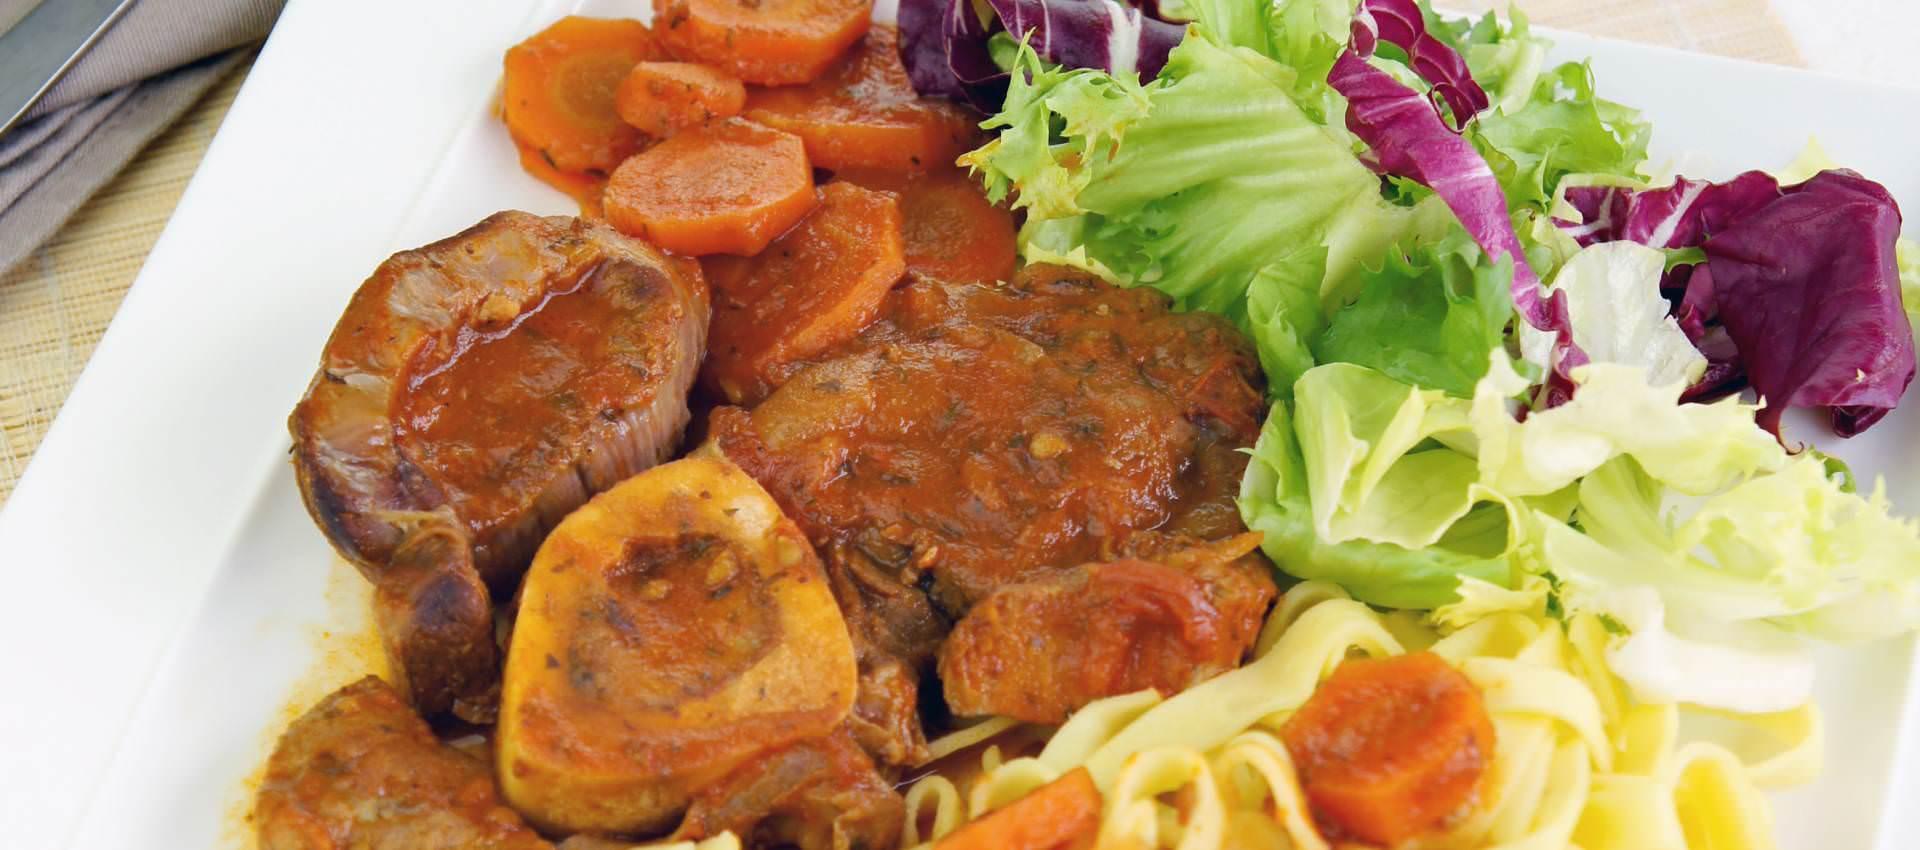 Osso bucco un grand classique de la cuisine italienne - Cuisine italienne osso bucco ...